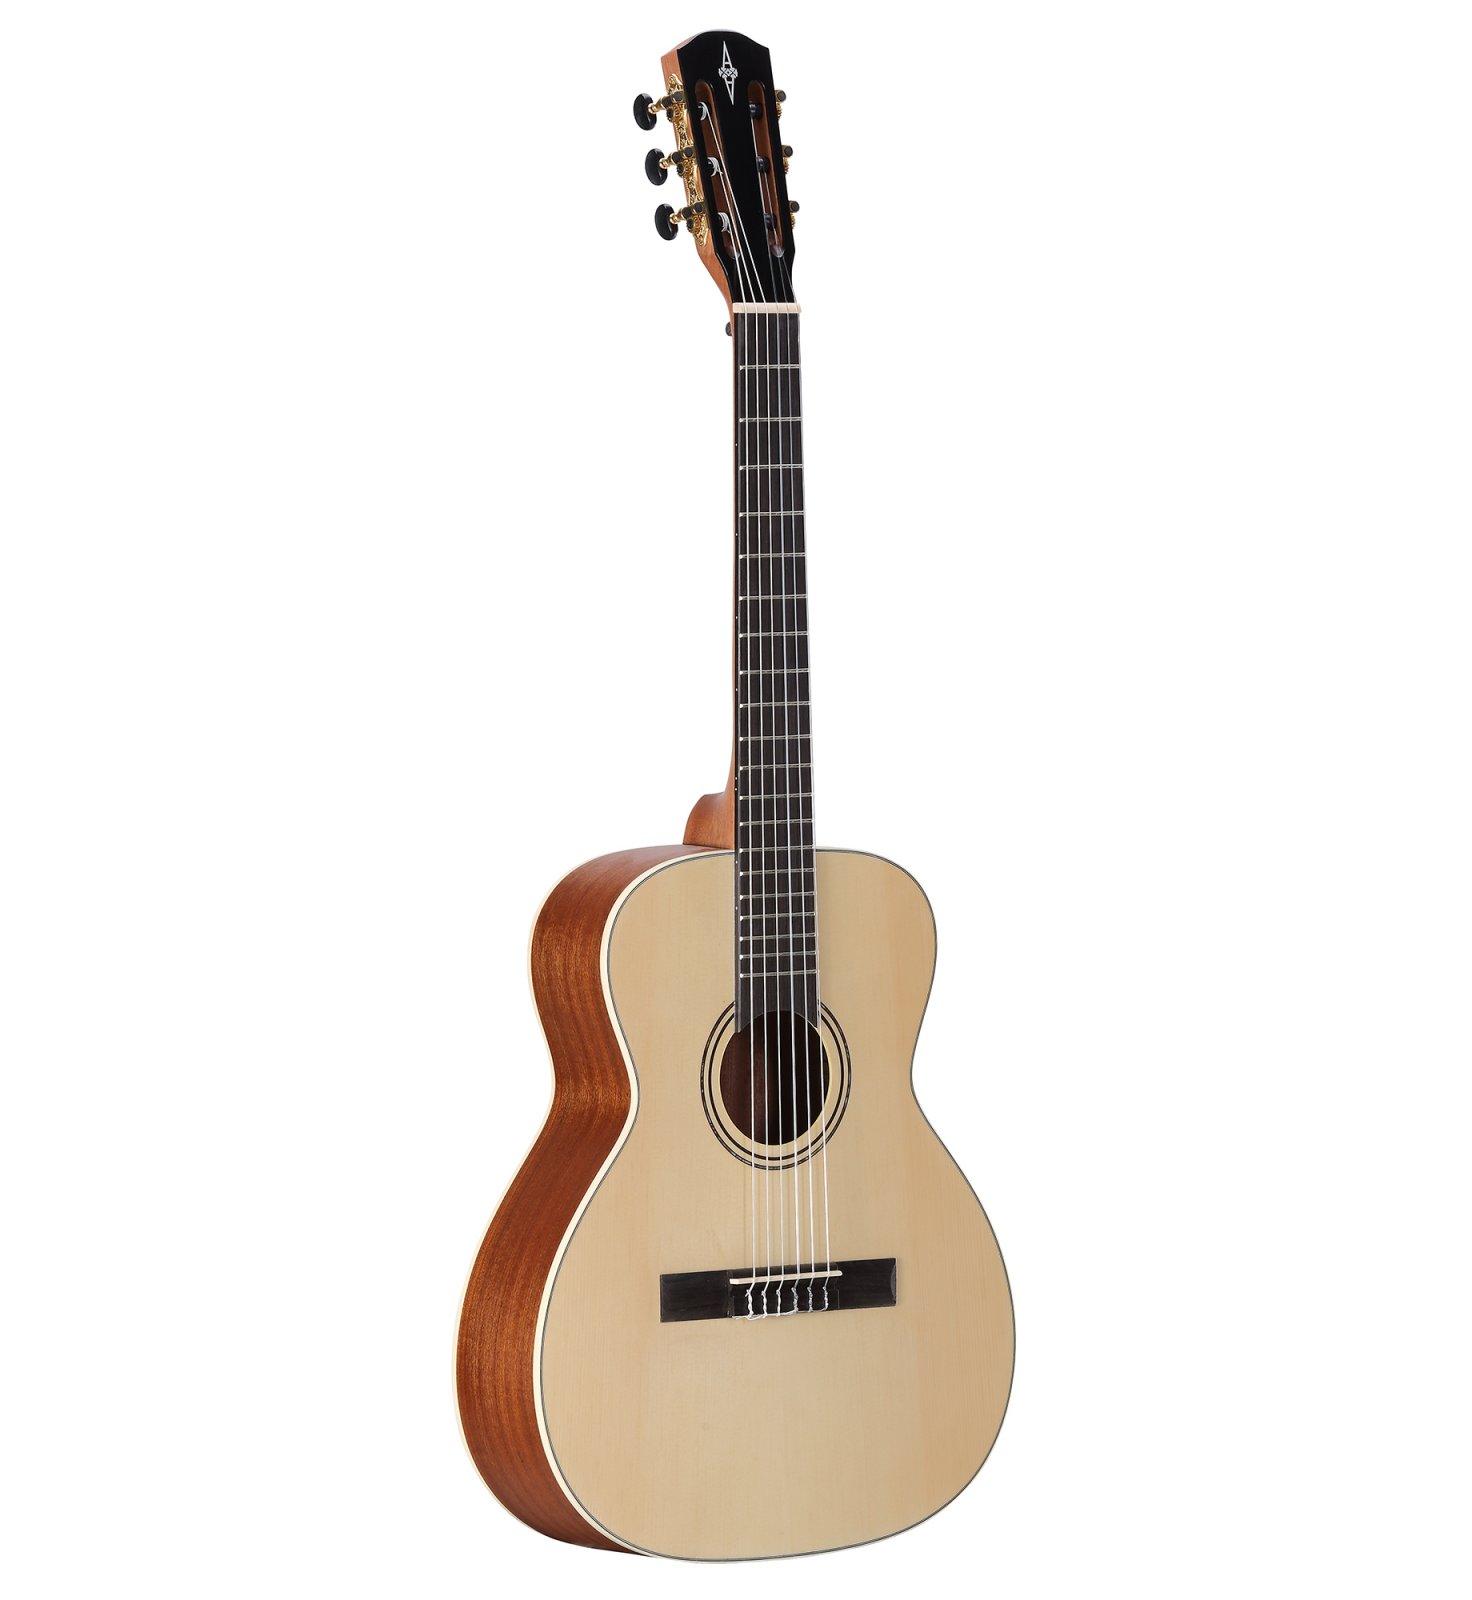 Alvarez RS26N School Series Nylon String Short Scale Student Guitar w/Gig Bag